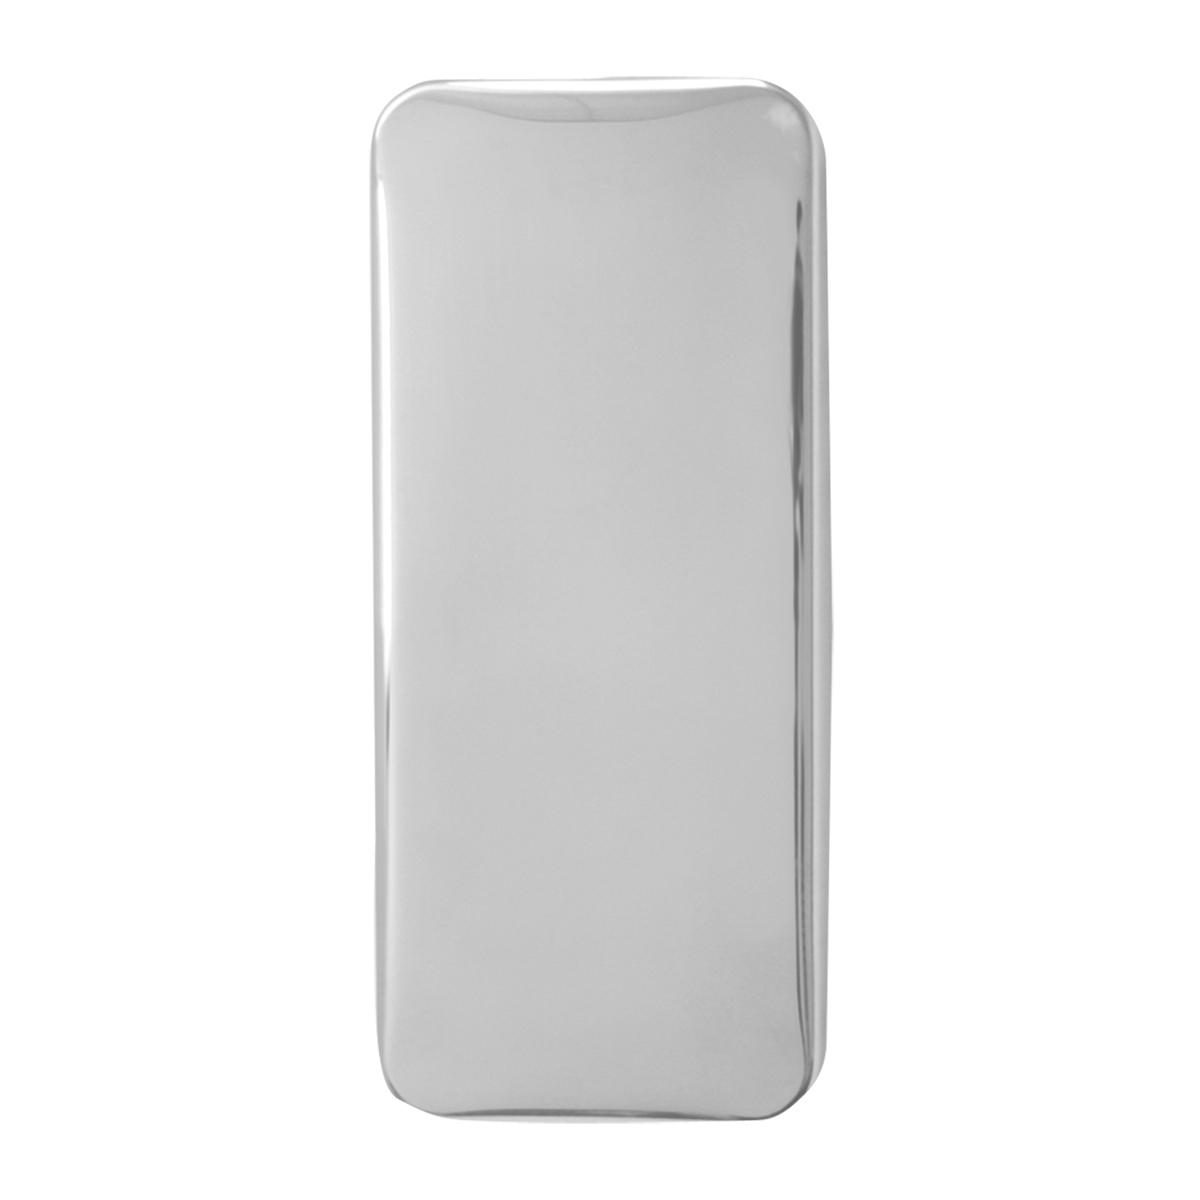 97572 Exterior Sleeper Vent Cover for Peterbilt